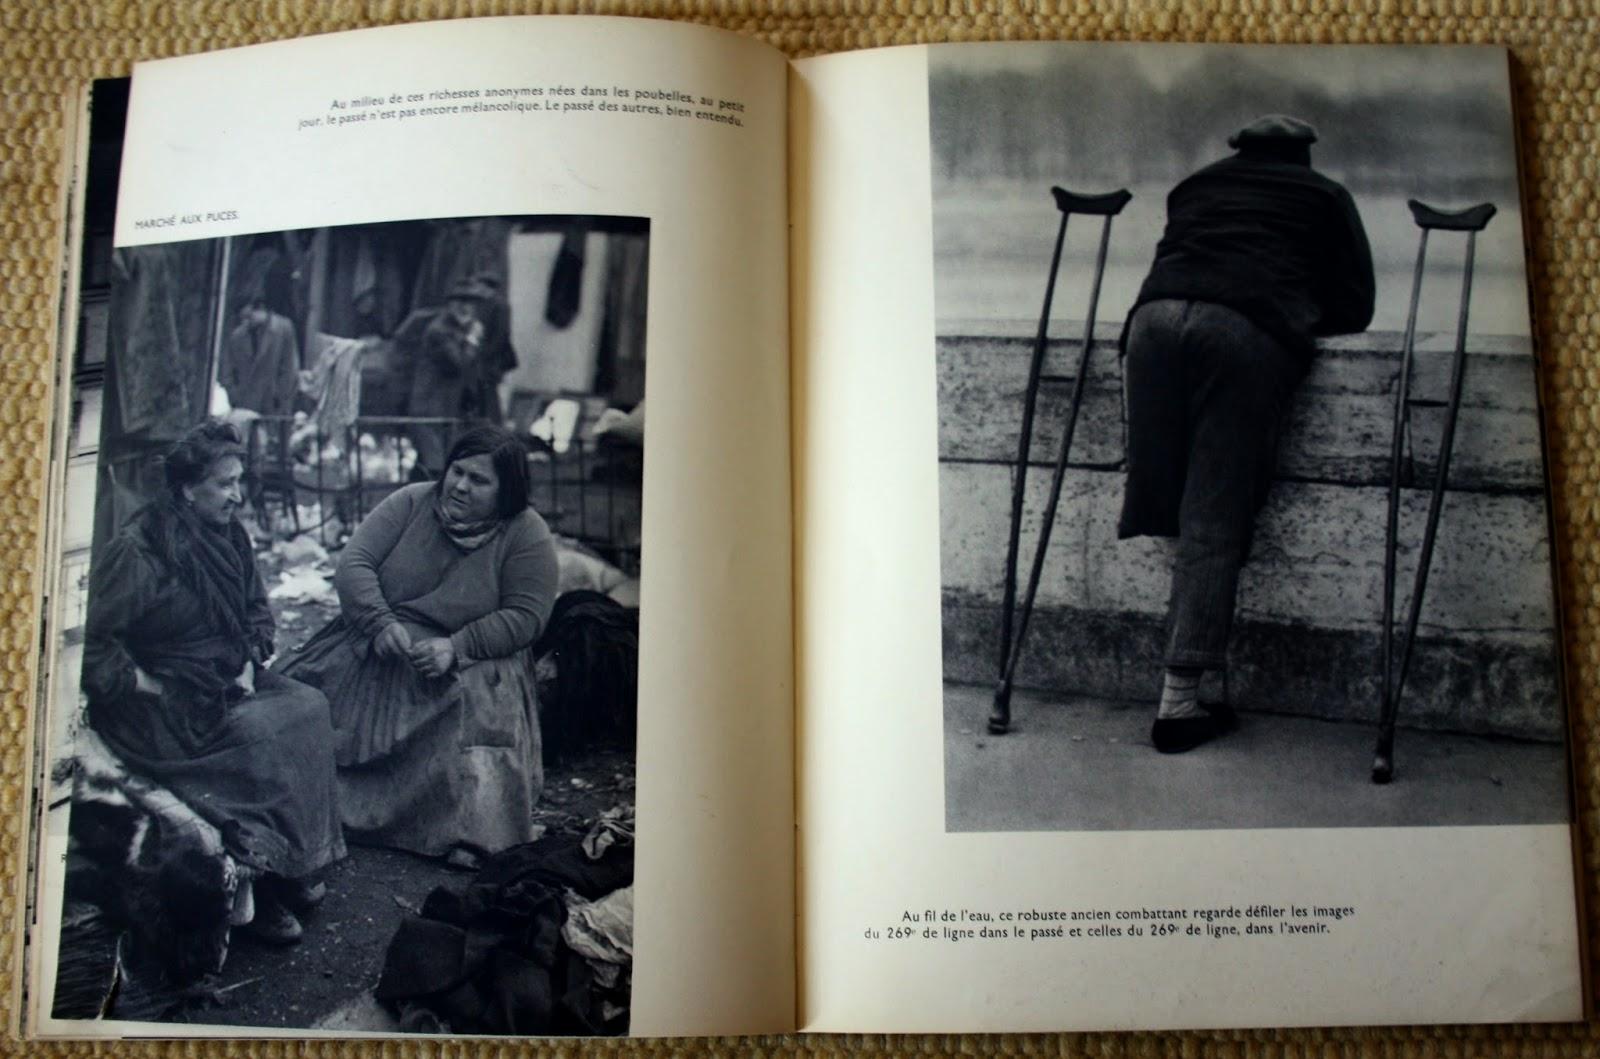 Bint Photobooks On Internet Page 9 Chan 12121152 Rssing Com